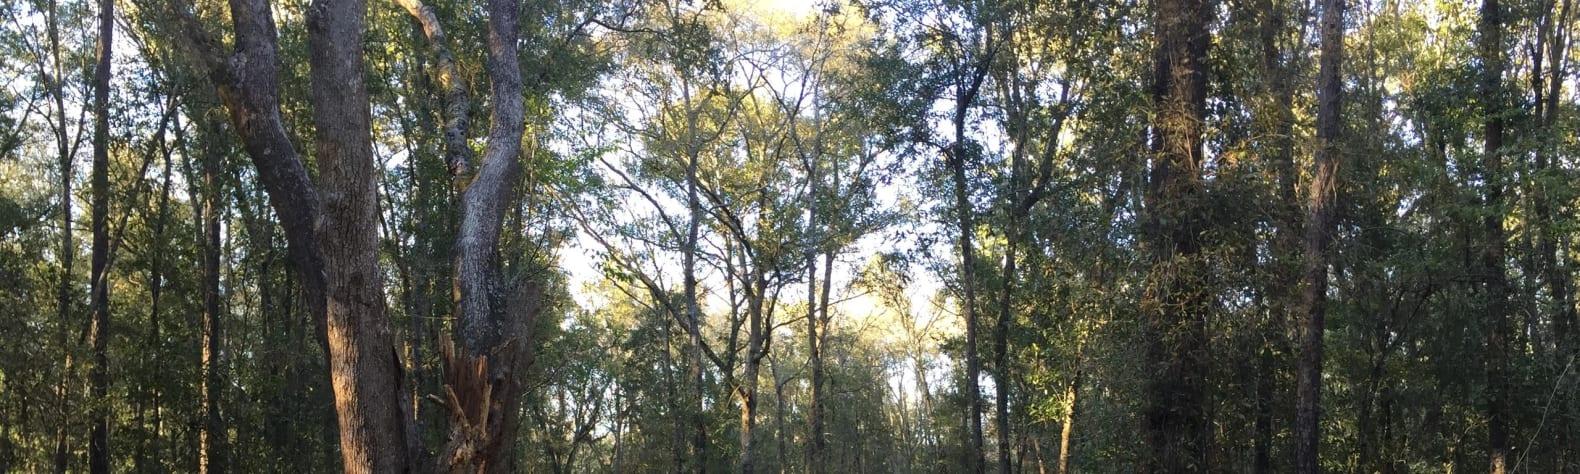 Pearly oaks